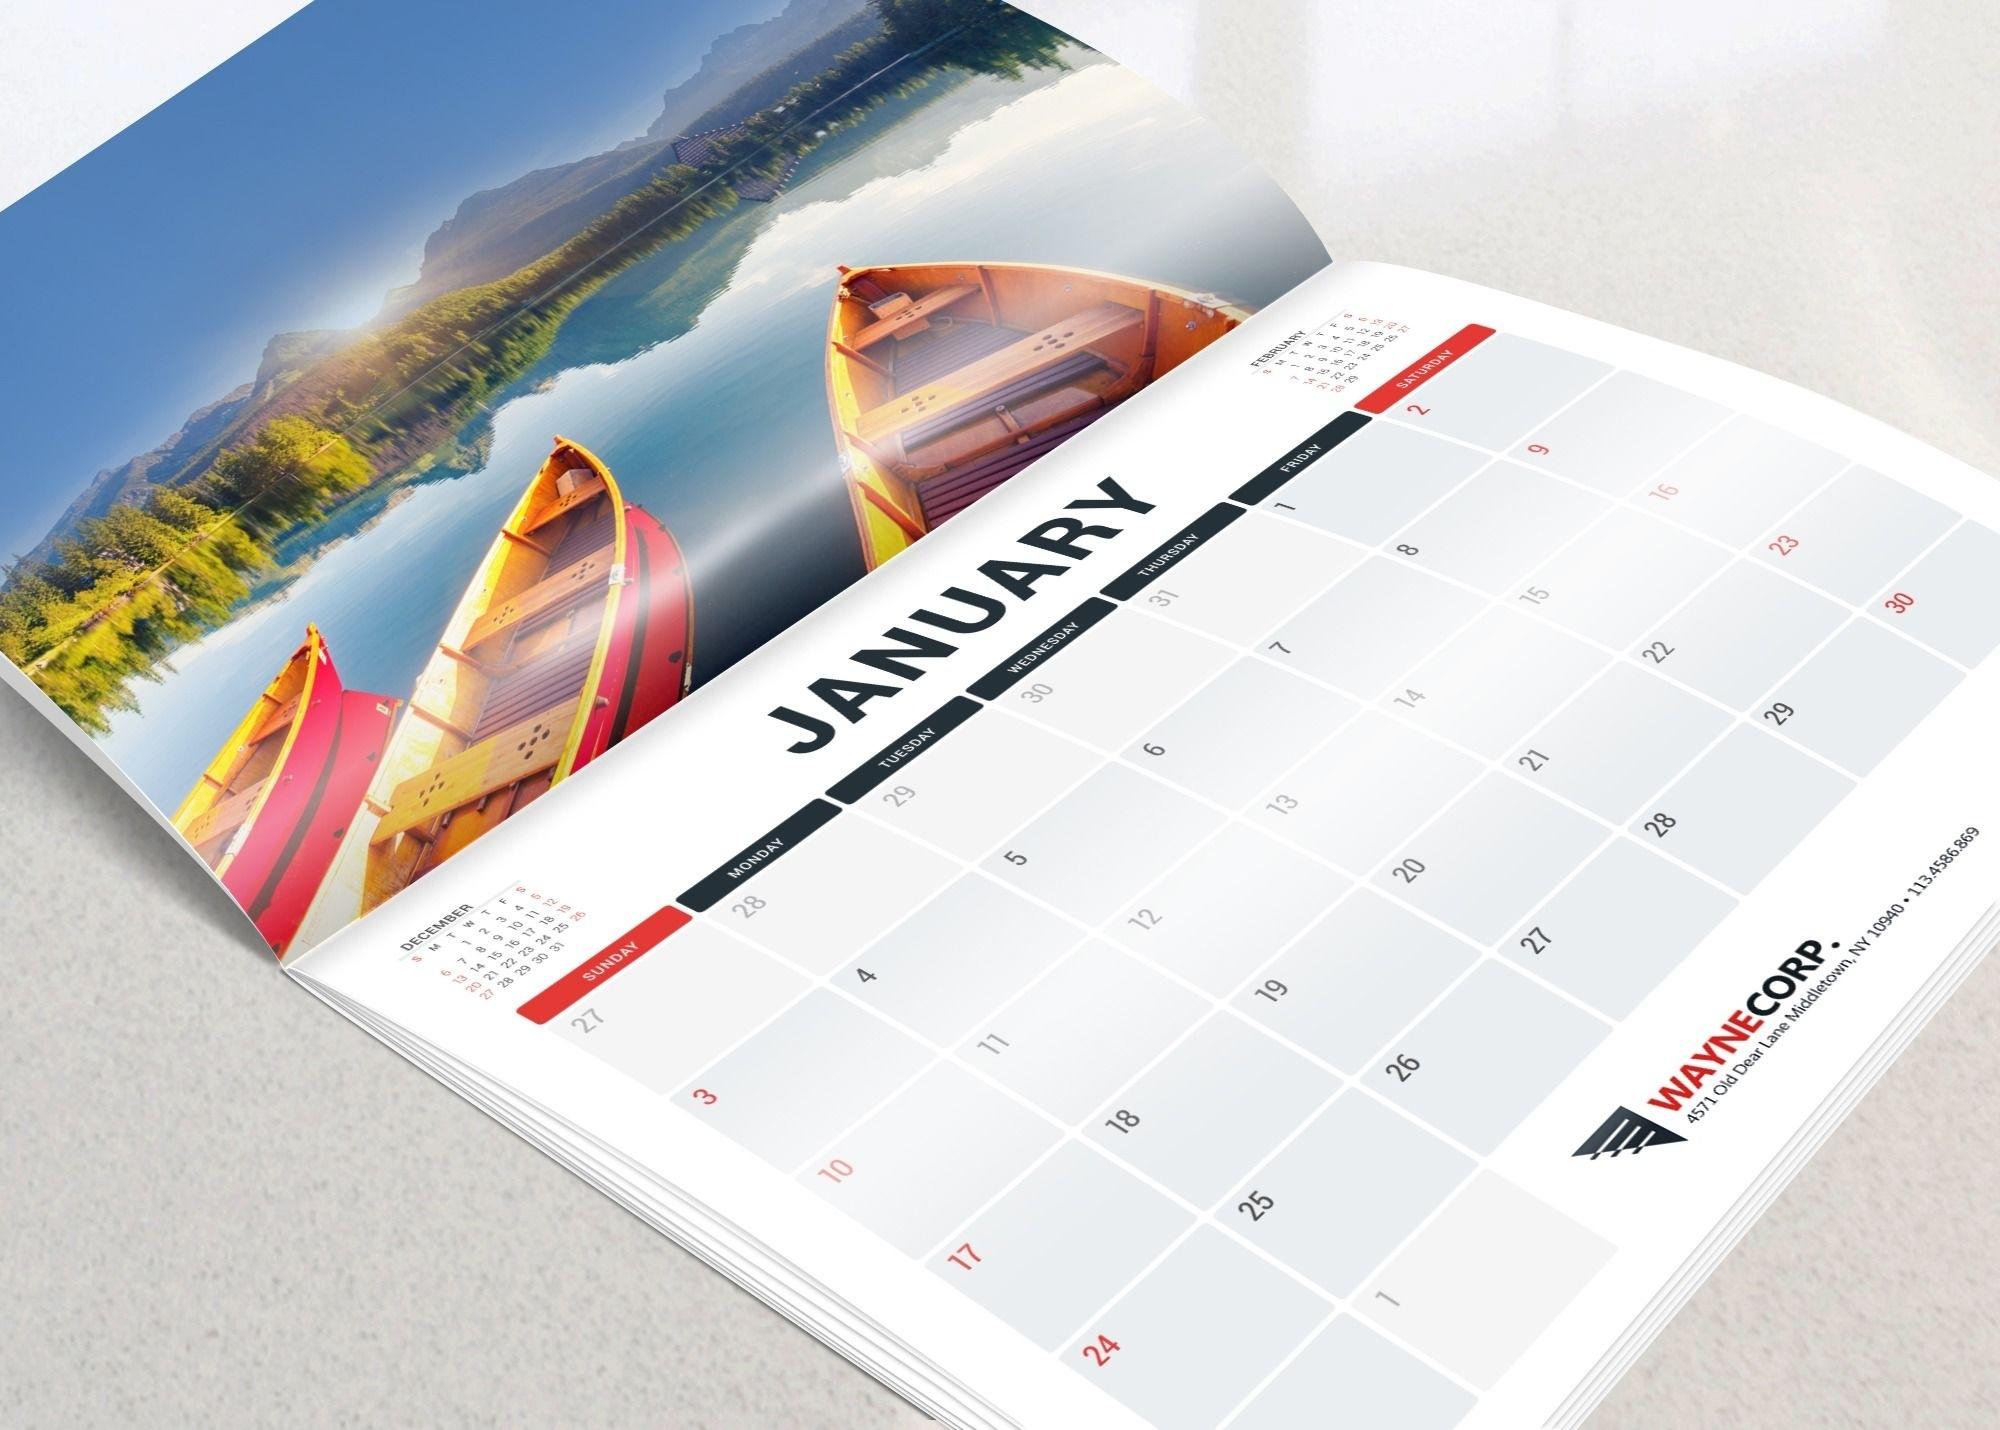 Calendar Printing | Sameday Printing, Sameday Flyers, Election Calendar Printing South Africa